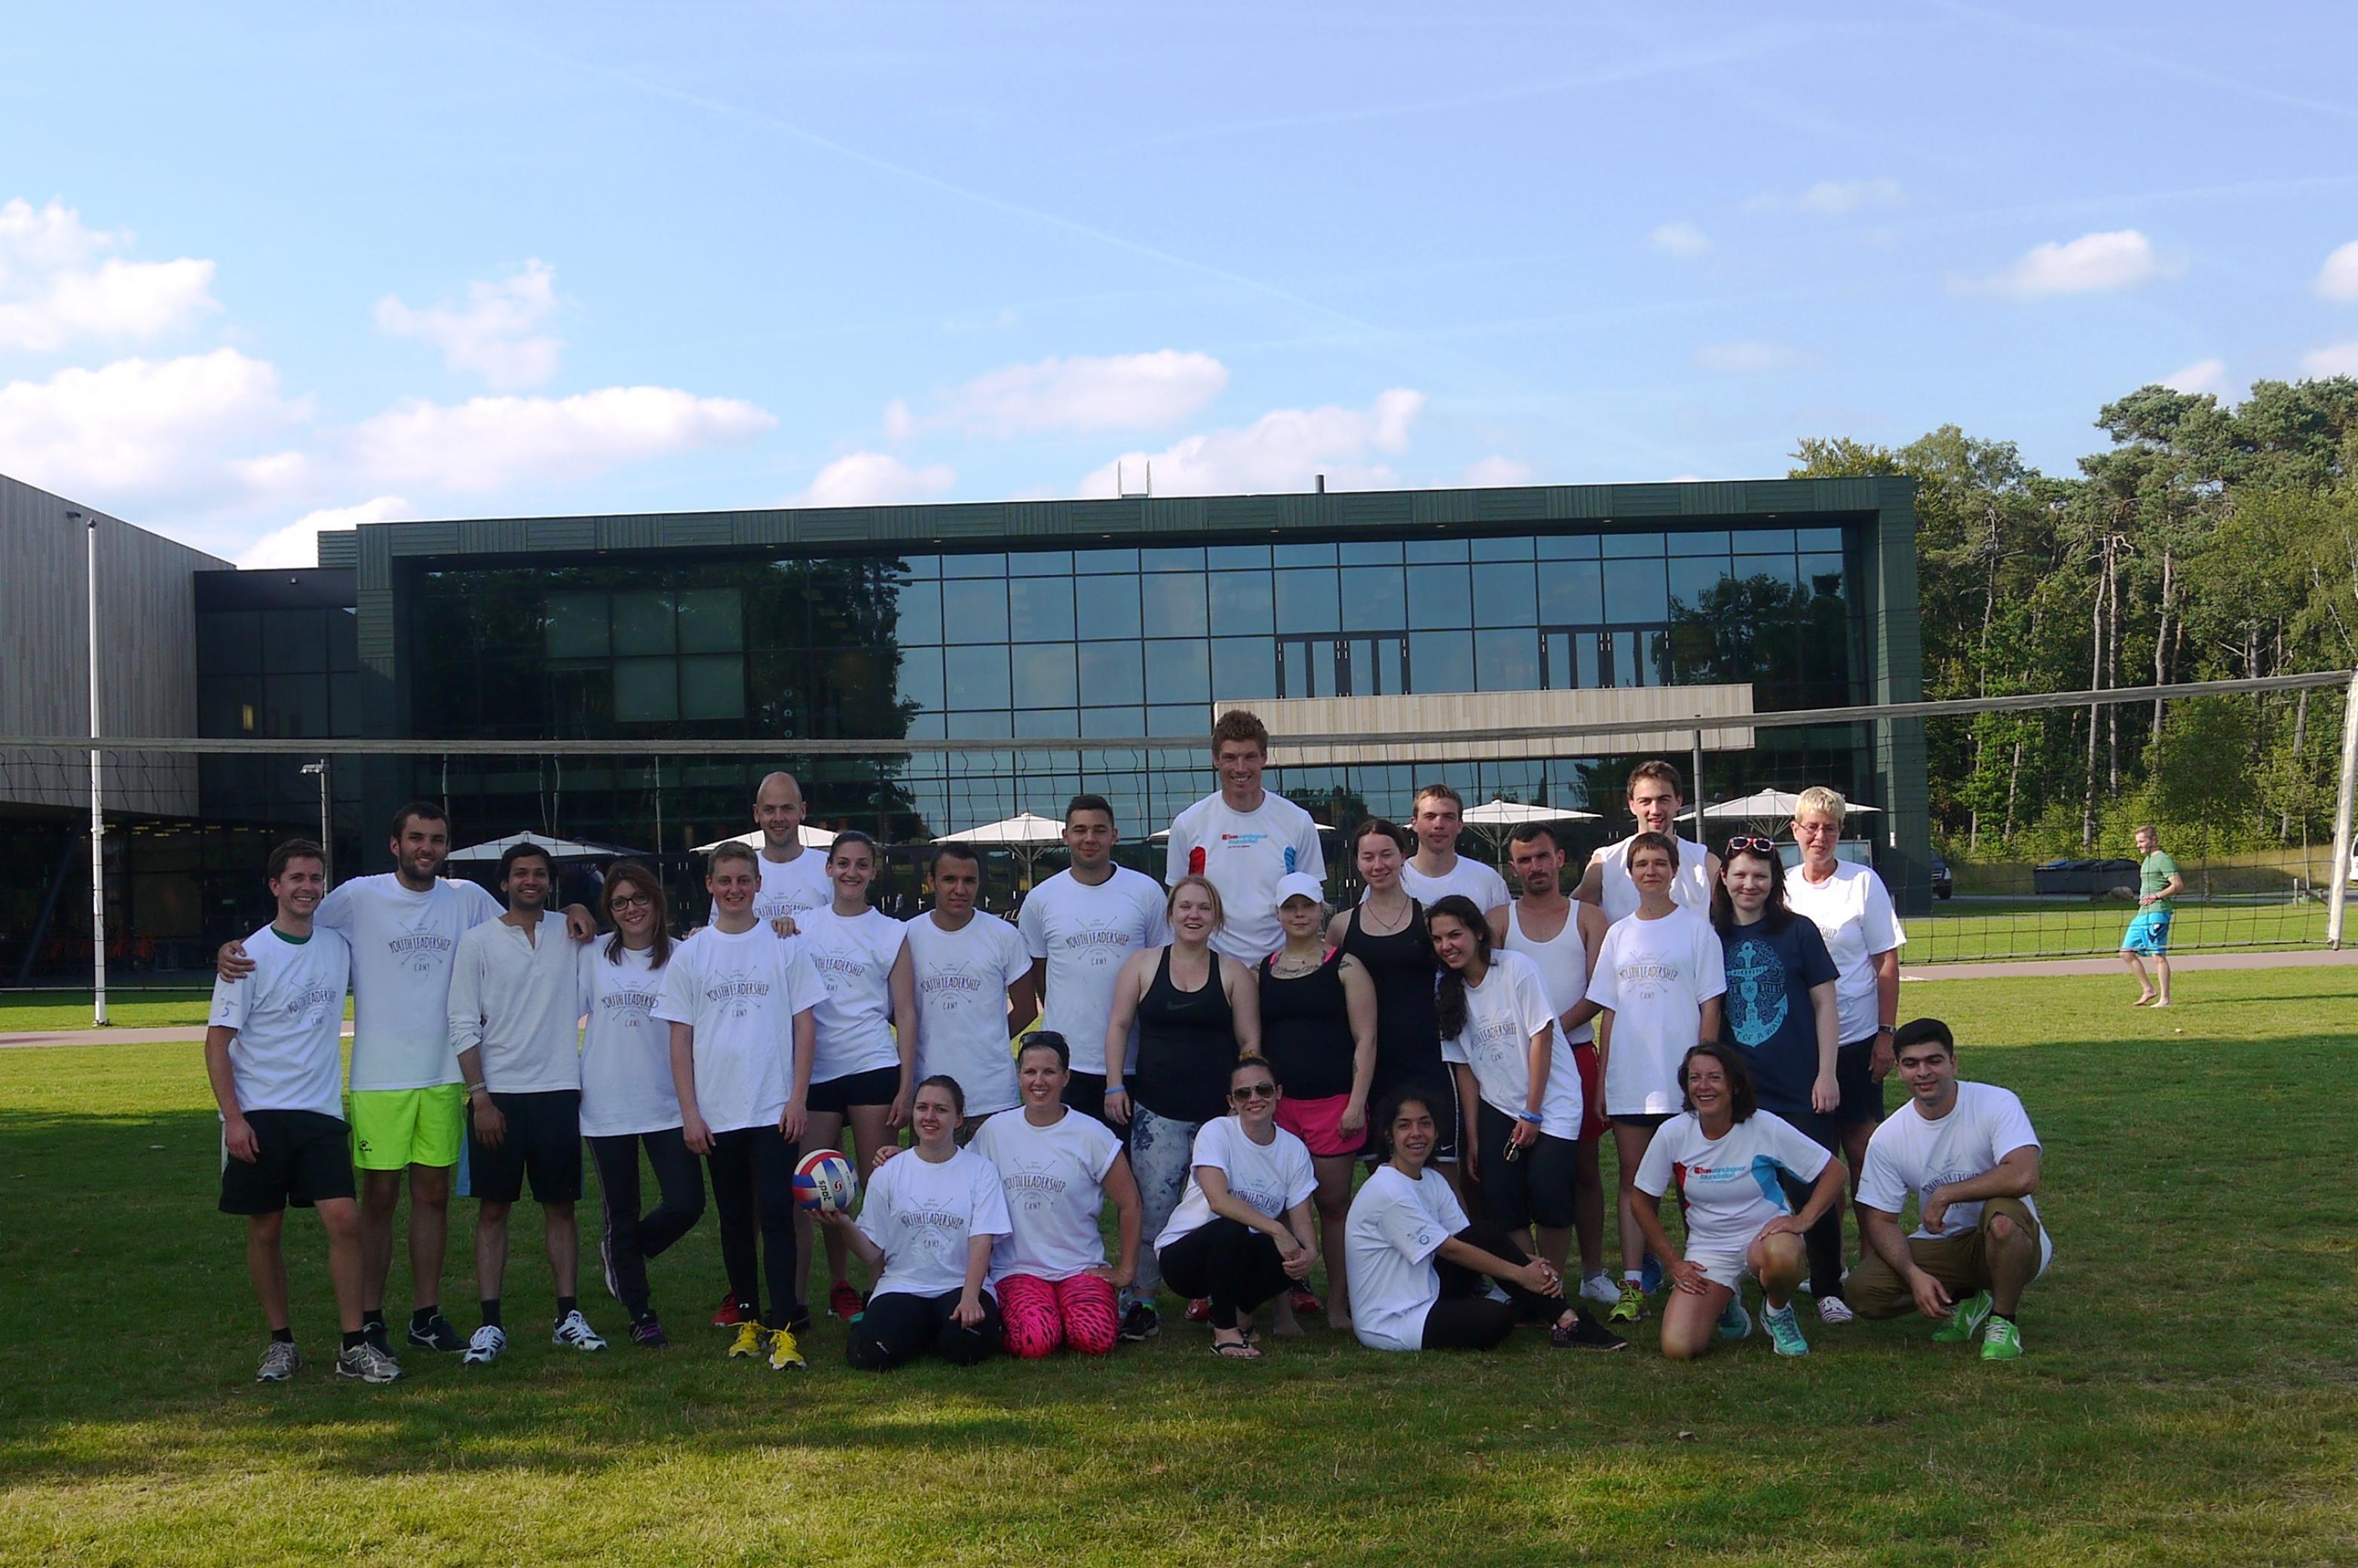 Summercamp Gruppe Arnheim 2015 - Gruppenfoto